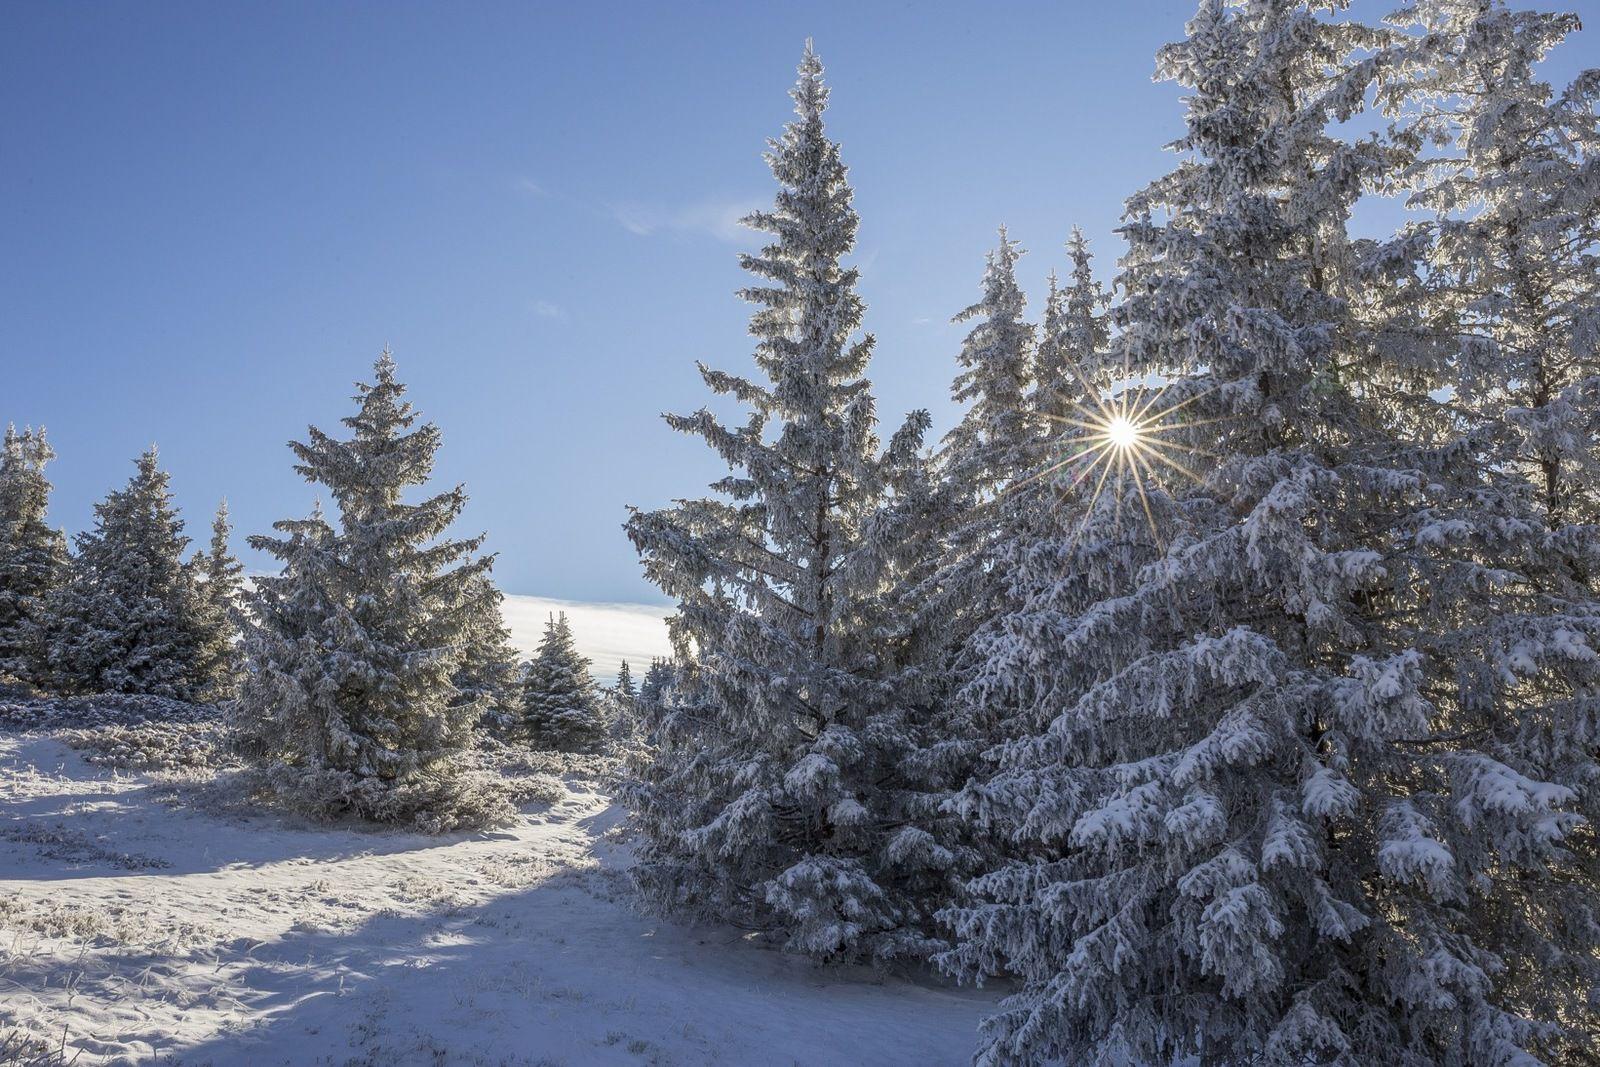 Trottiner sur la neige